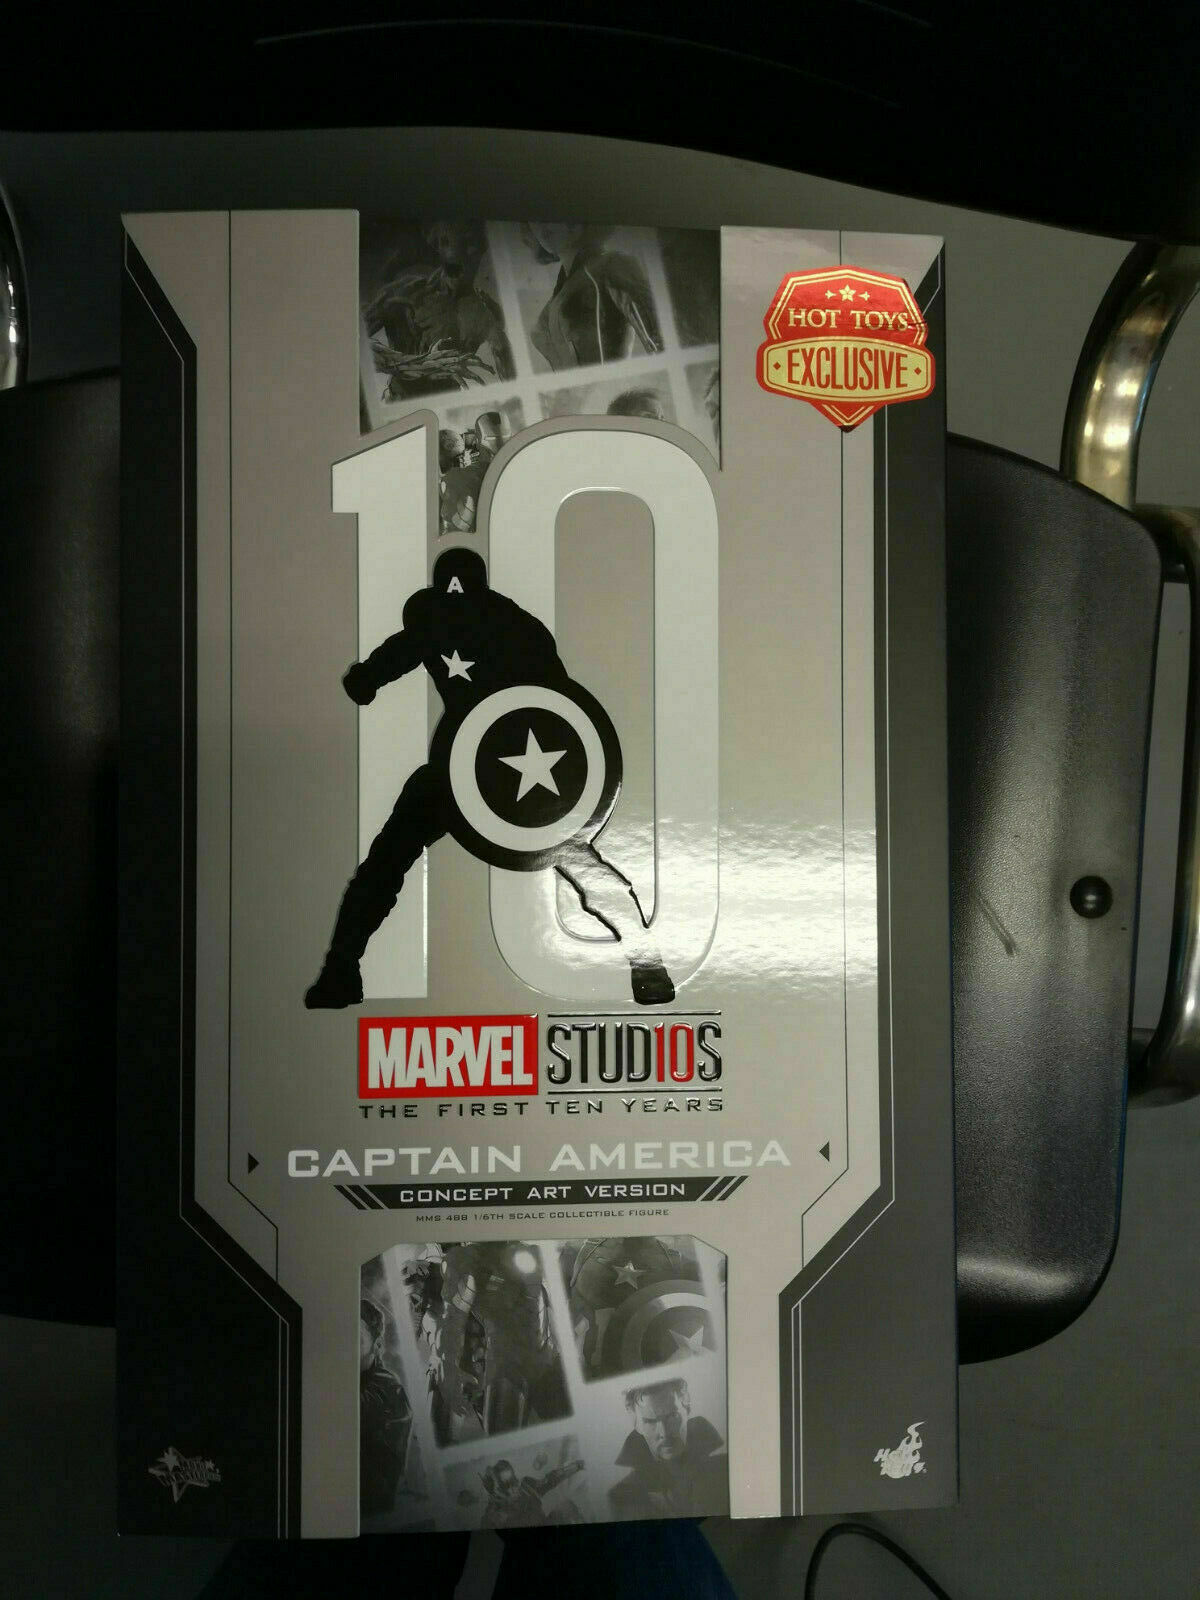 Hot Toys Captain America Concept Art Version 1 6 Scale Figure MMS 288